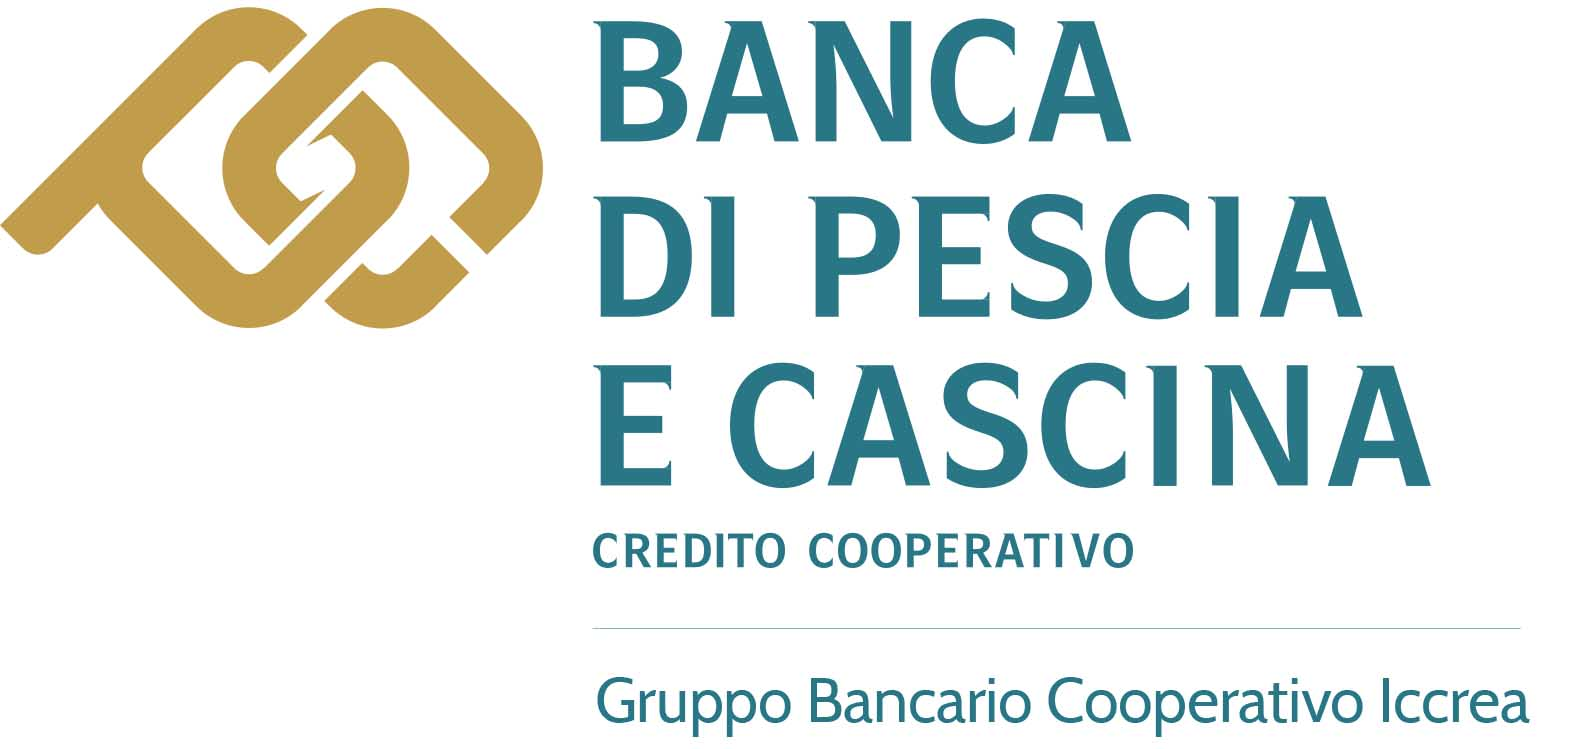 http://pescia.iltuopaese.com/wp-content/uploads/2021/03/logo-banca-pescia.jpg